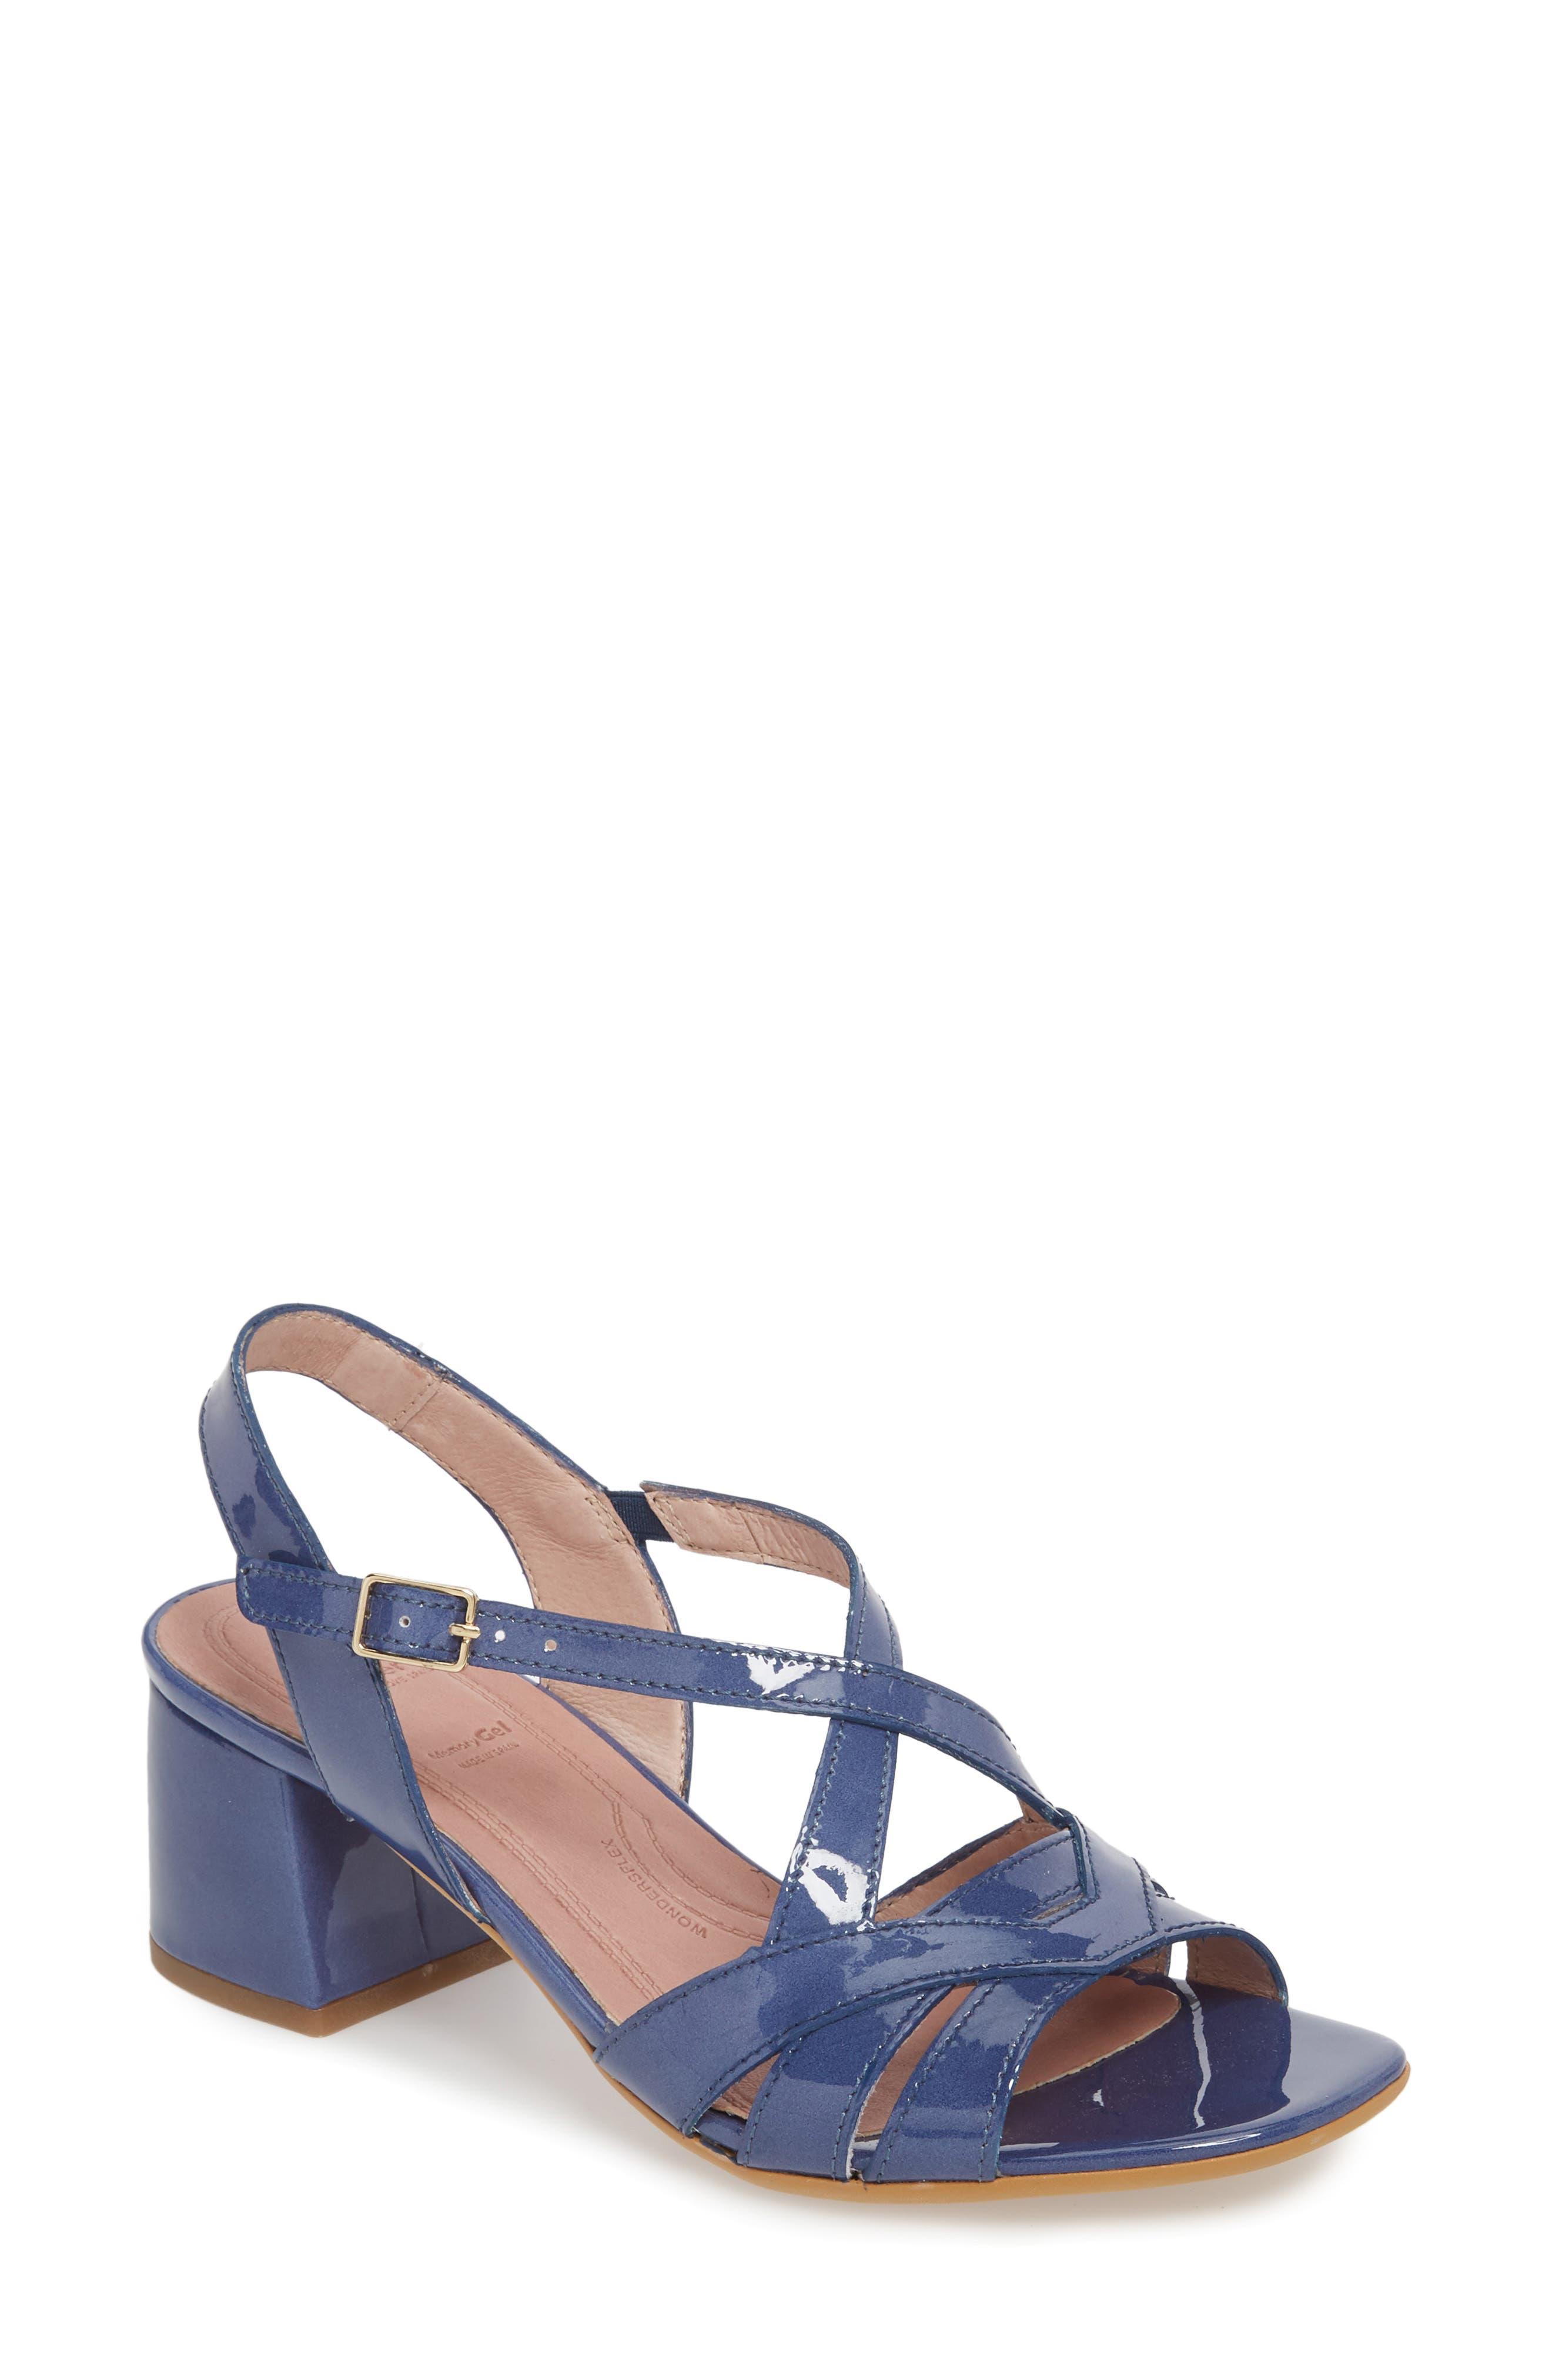 Block Heel Sandal,                             Main thumbnail 1, color,                             Jean Patent Leather